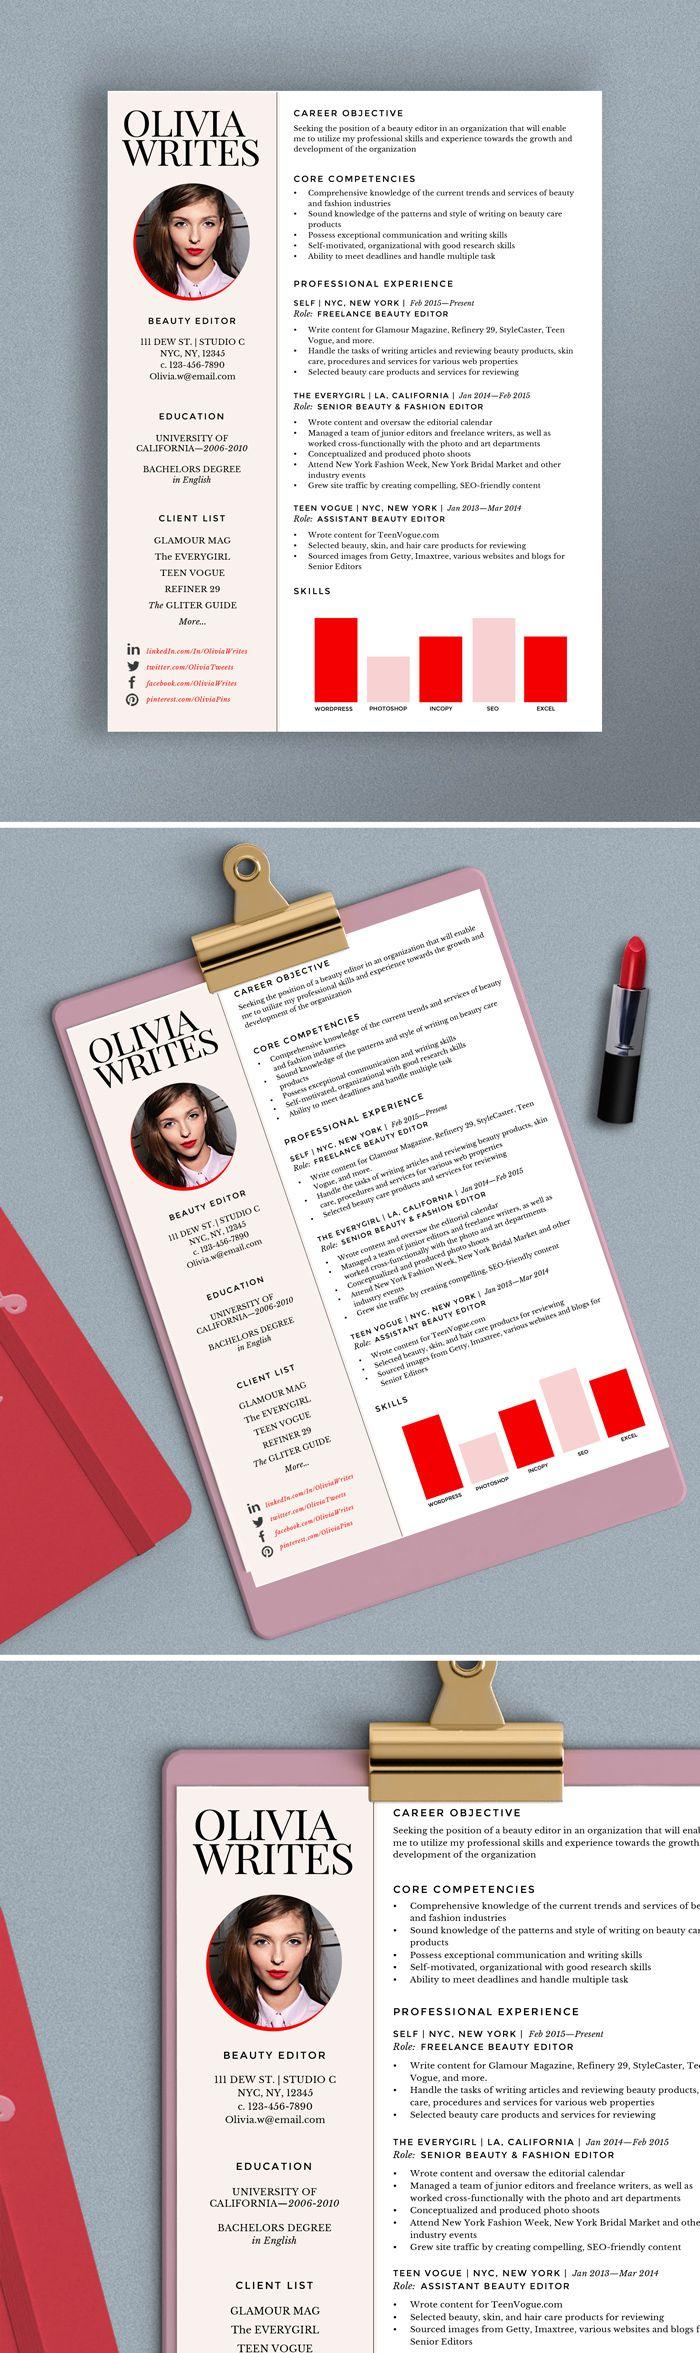 Modern & Feminine Résumé Template - Custom Résumé/CV - Instant ...